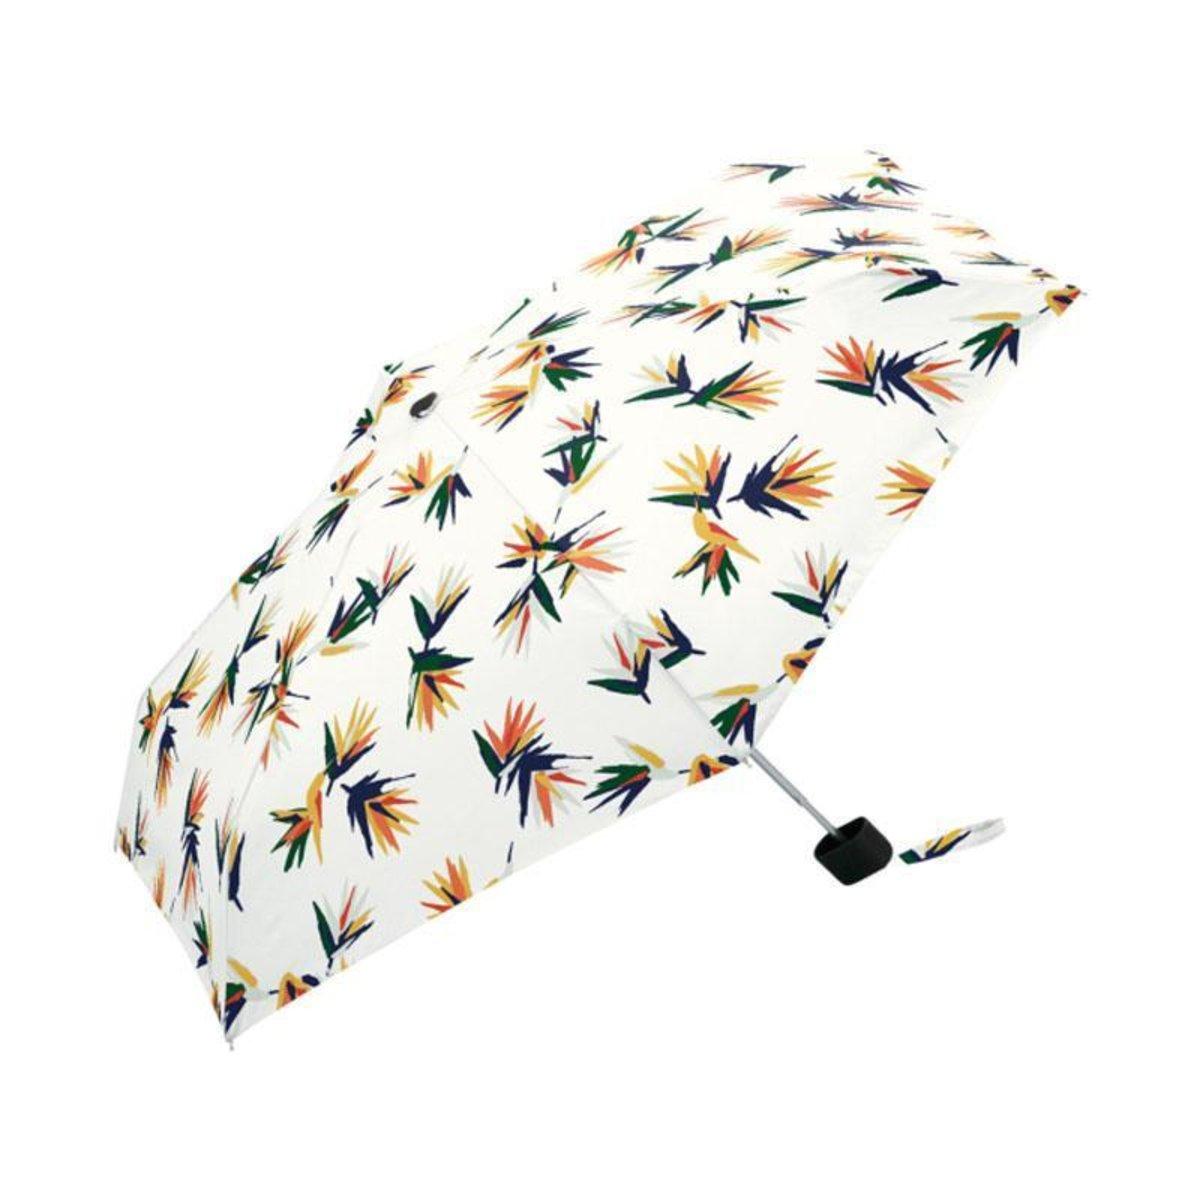 KiU Tiny 迷你縮骨遮 防UV雨傘 日本品牌 - 南國花鳥 Strelitzia